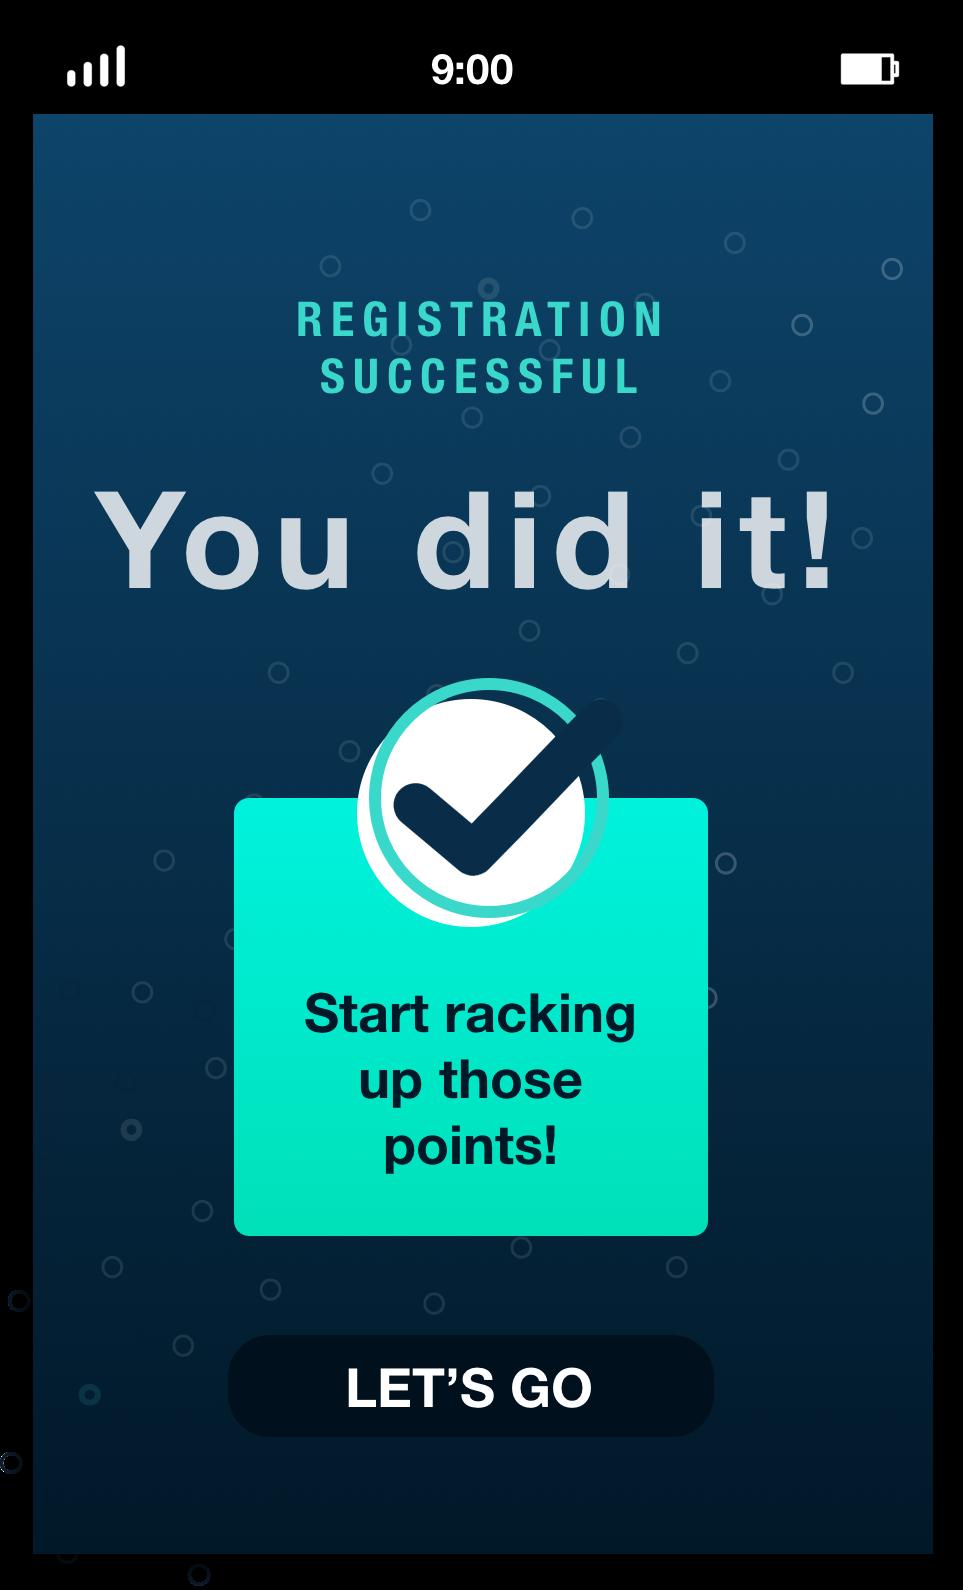 mobile user success message